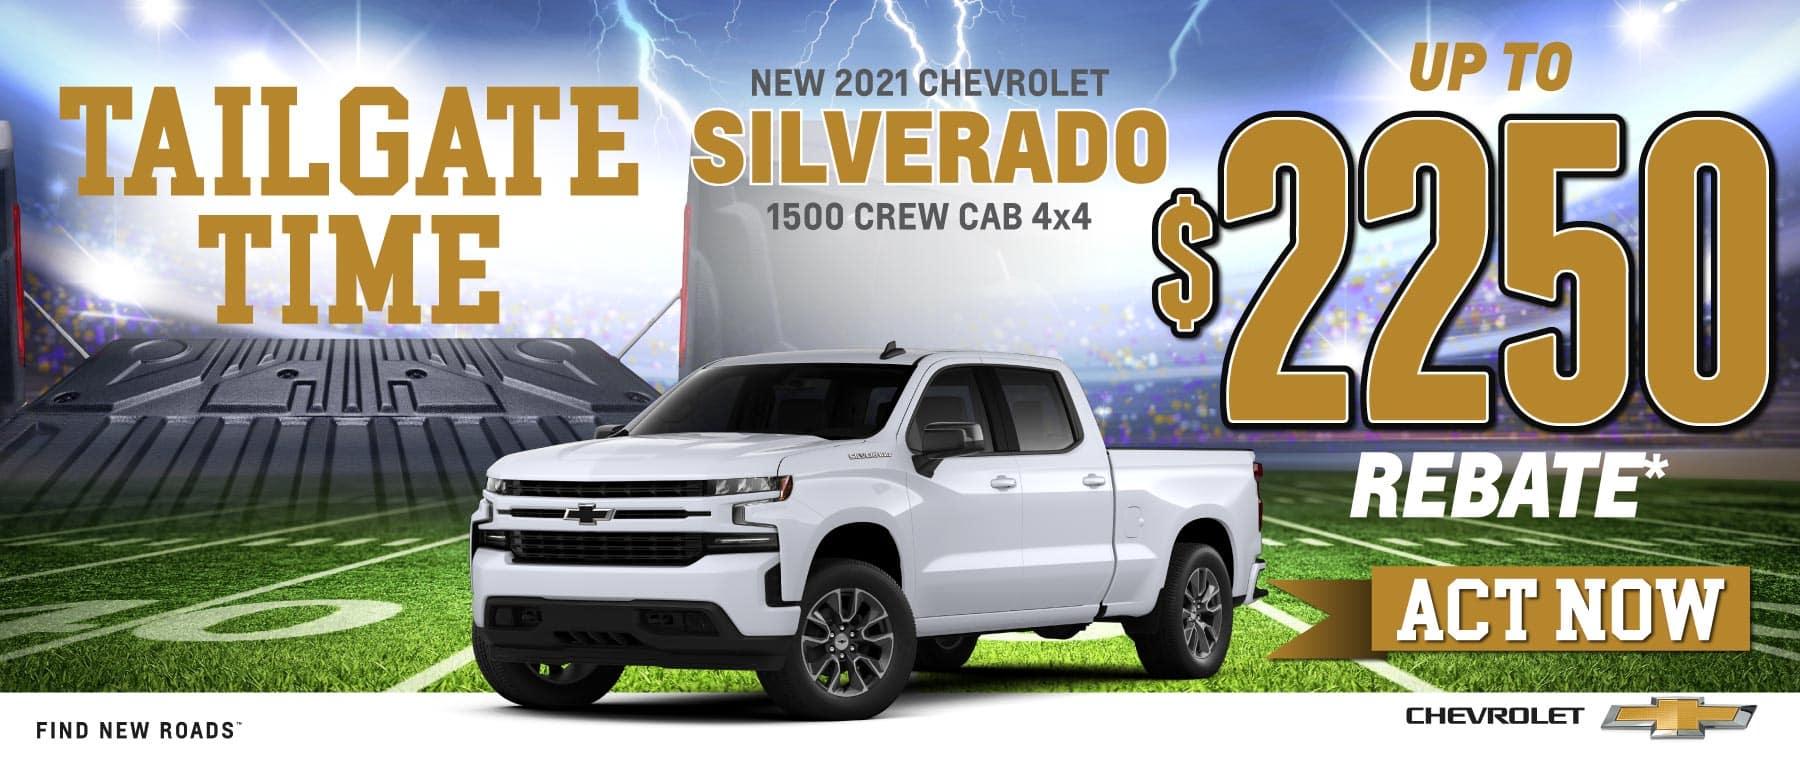 New 2021 Chevy Silverado - $2250 Customer Cash - Act Now